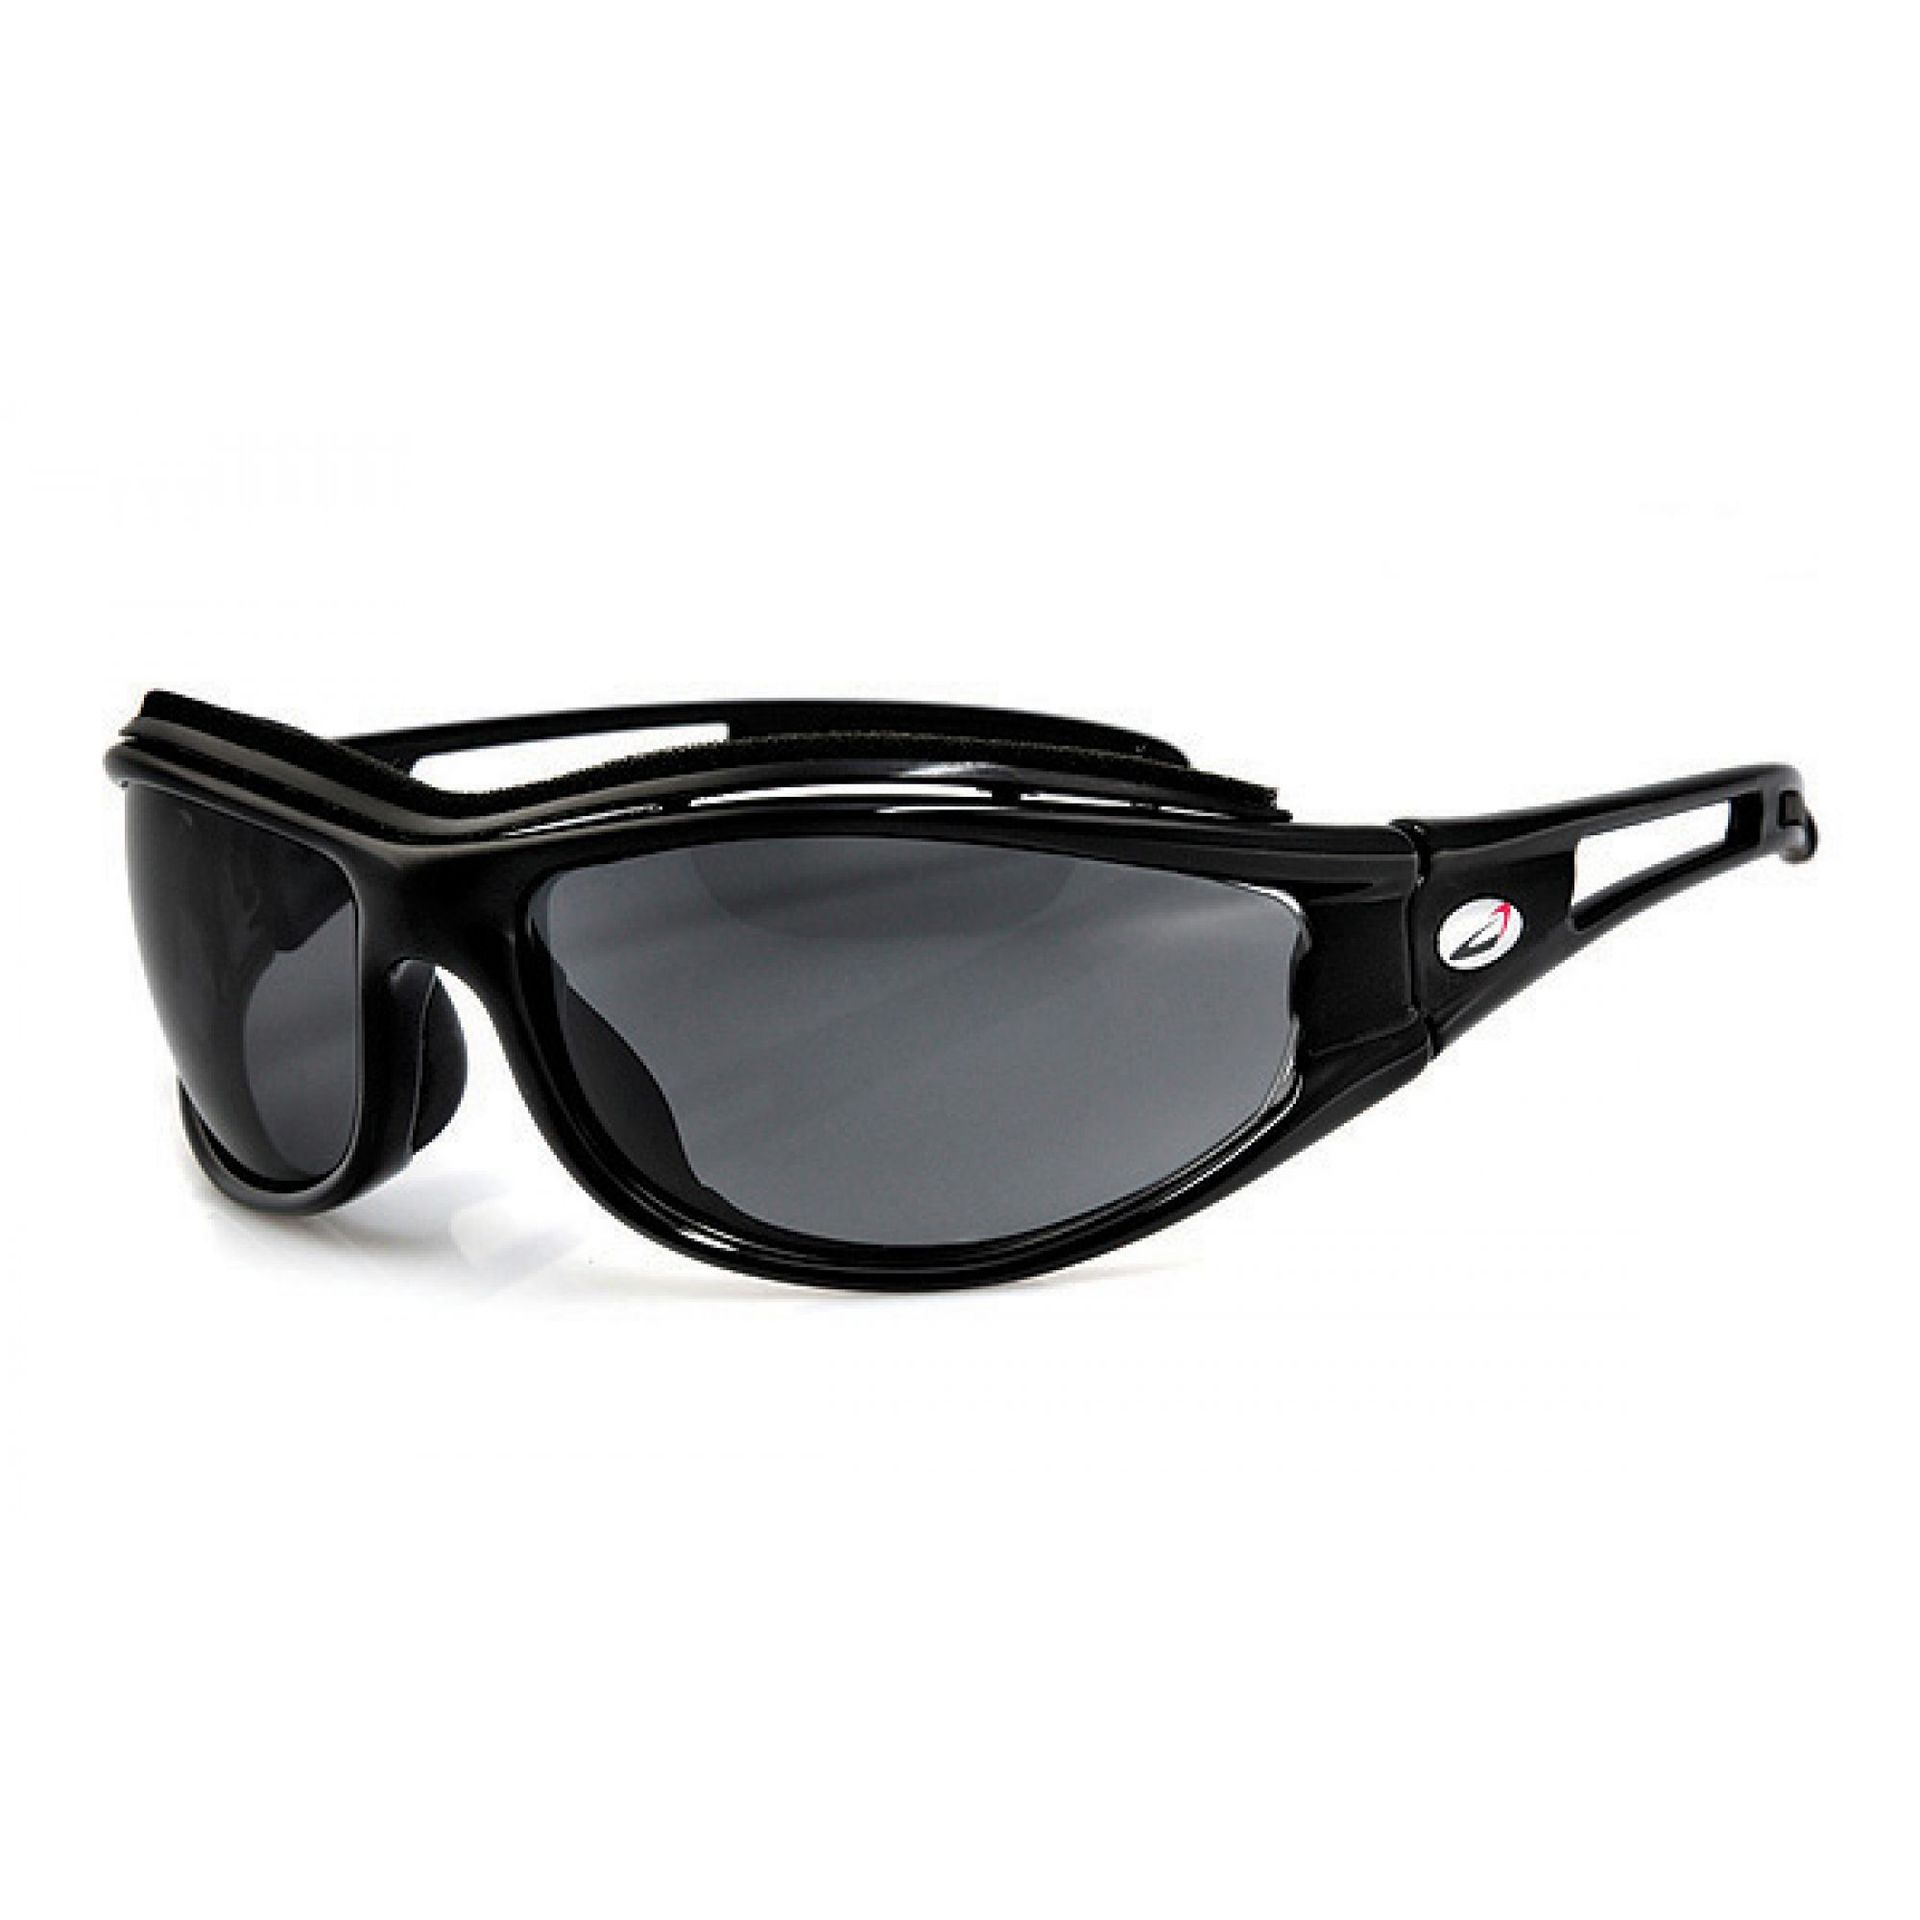 Okulary Arctica S-144 czarne